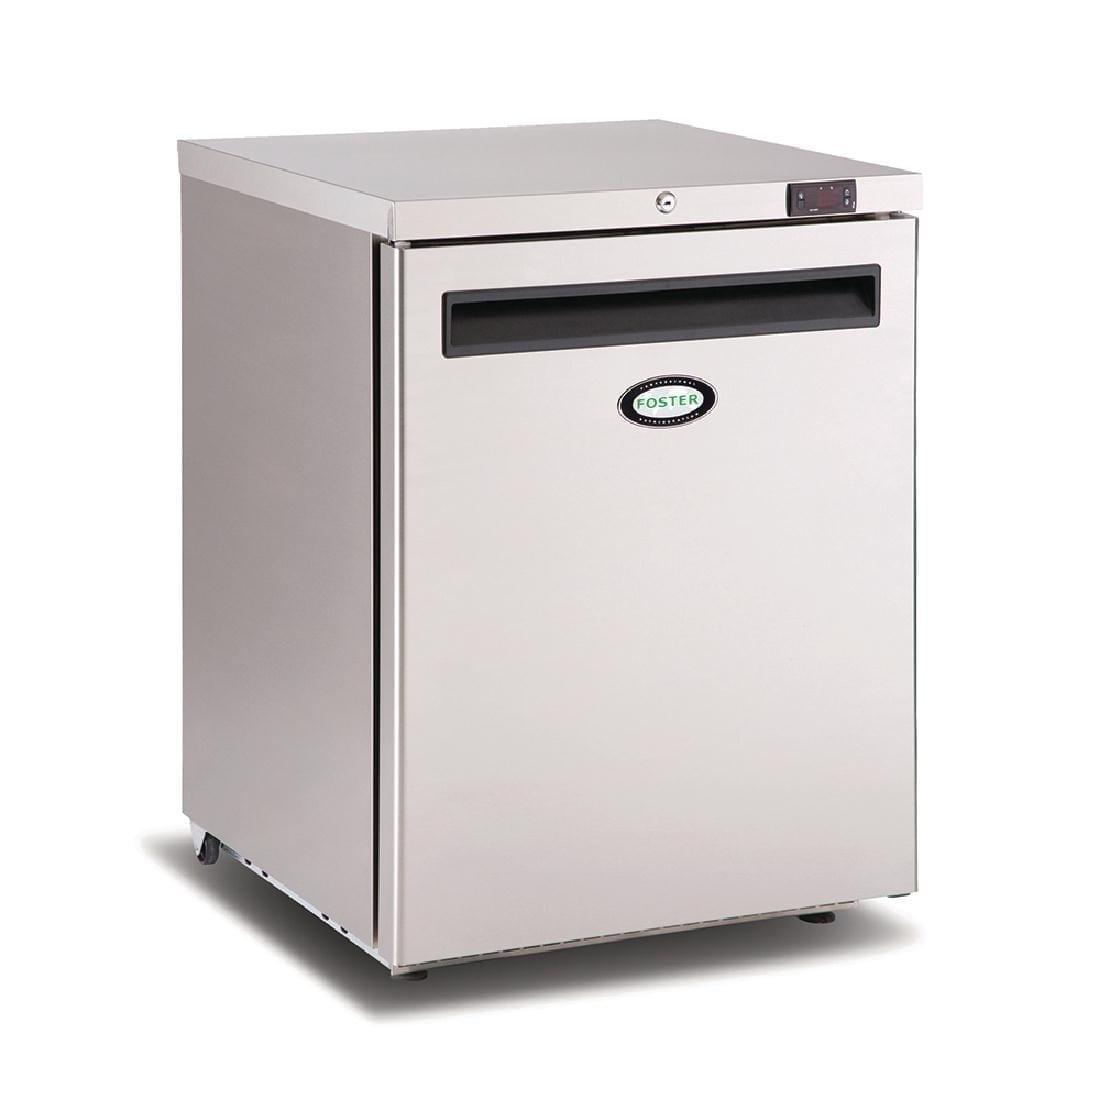 Foster 1 Door 150Ltr Undercounter Freezer R290 (StSt Ext Alu Int) (Direct)-0